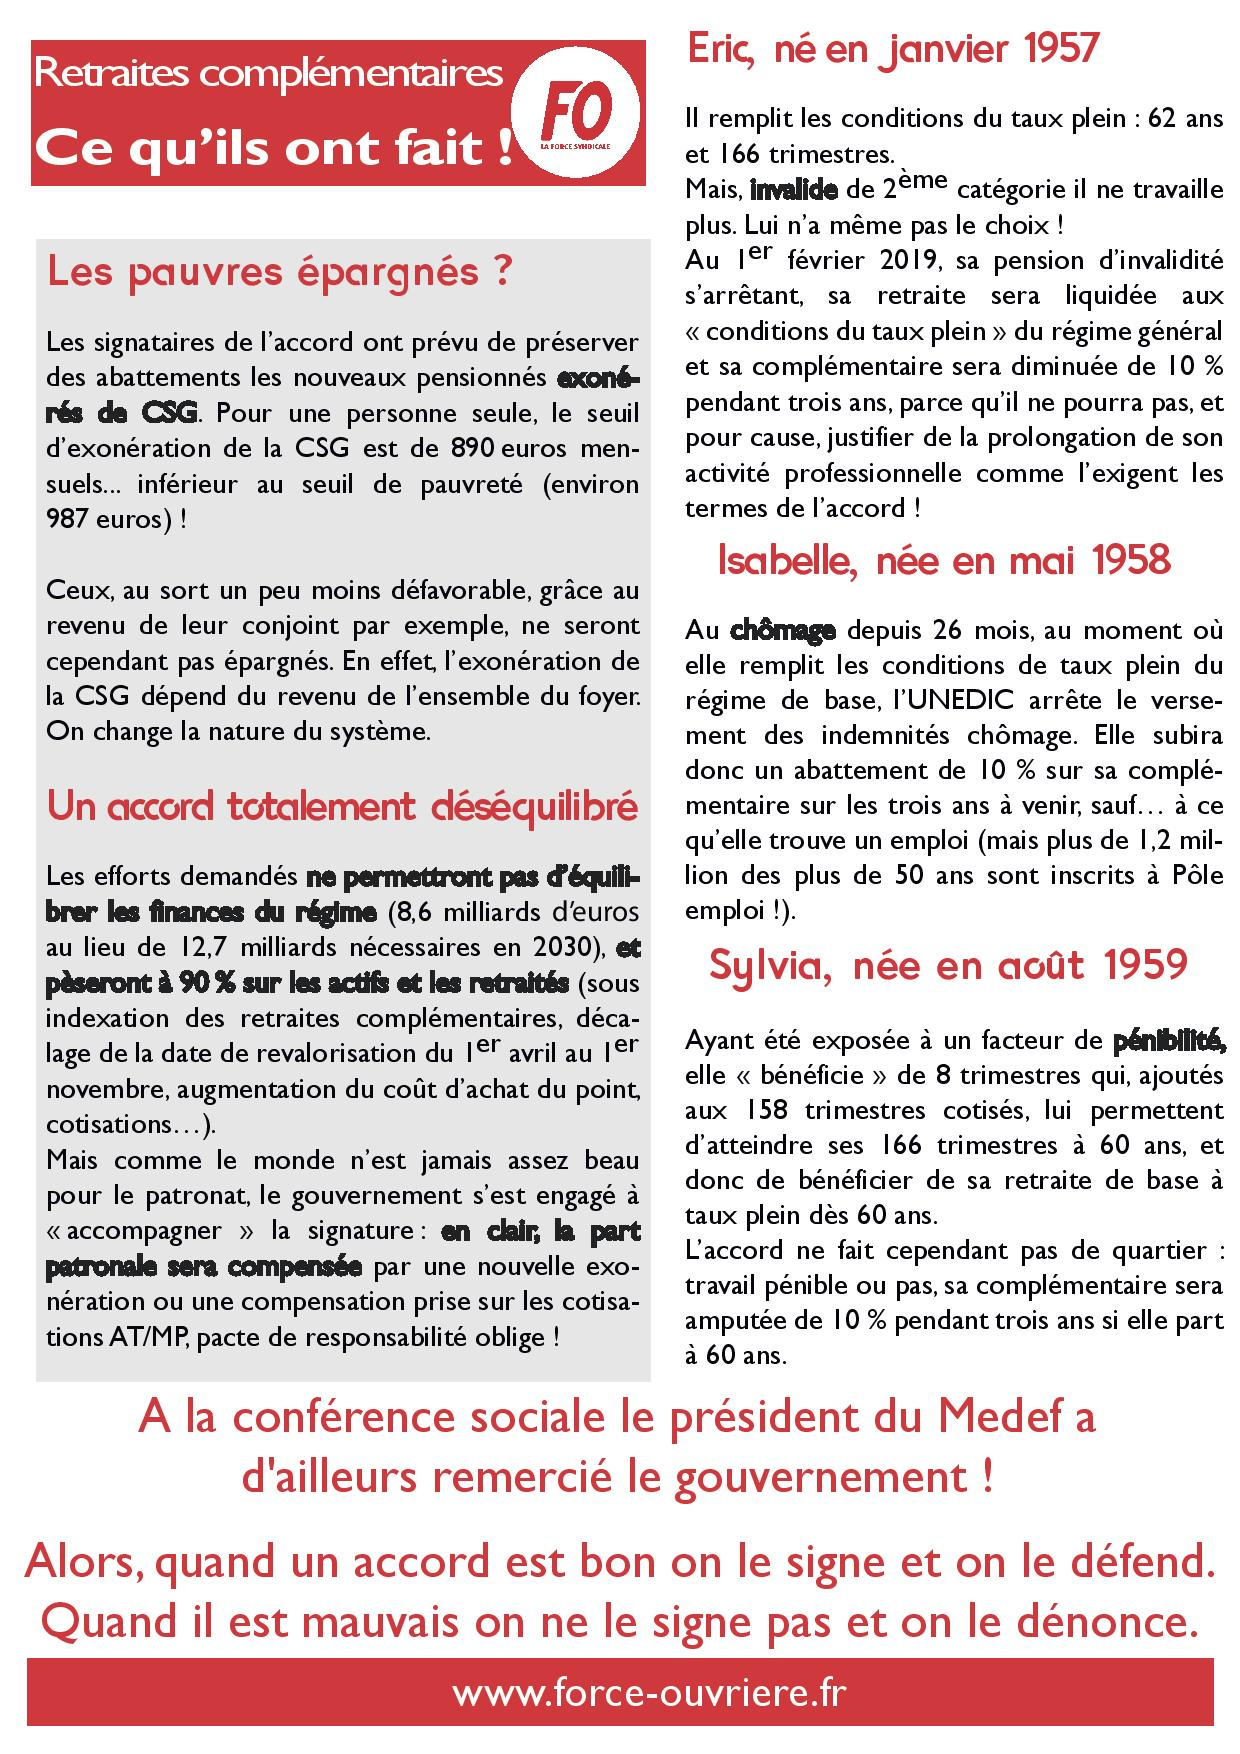 Retraites_rectoverso-page-002